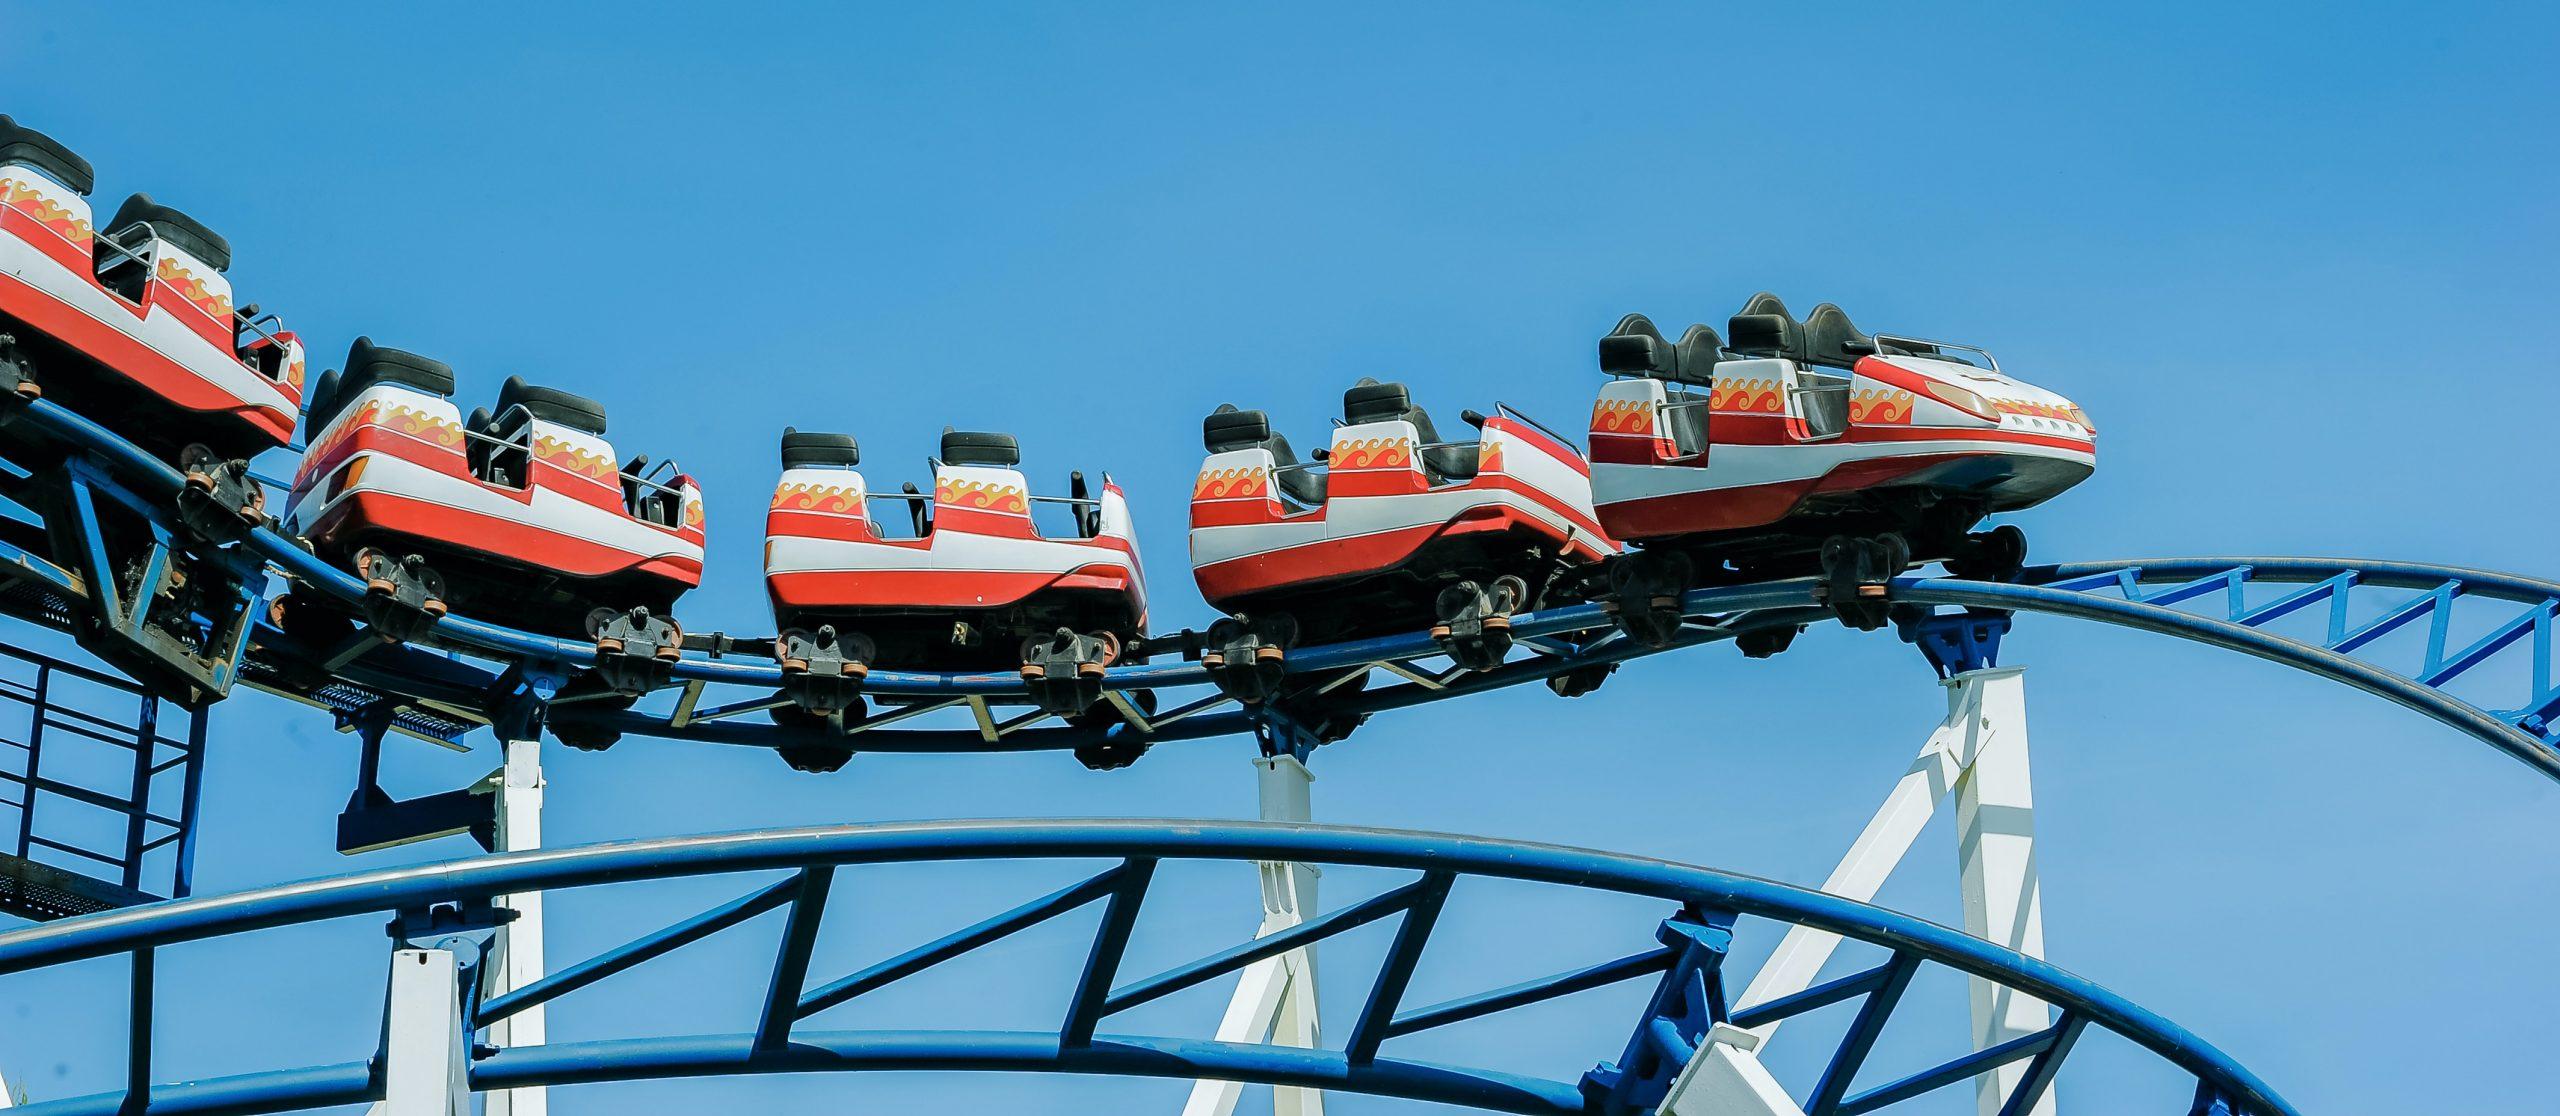 parc attraction - chauffeur vtc - bandrive